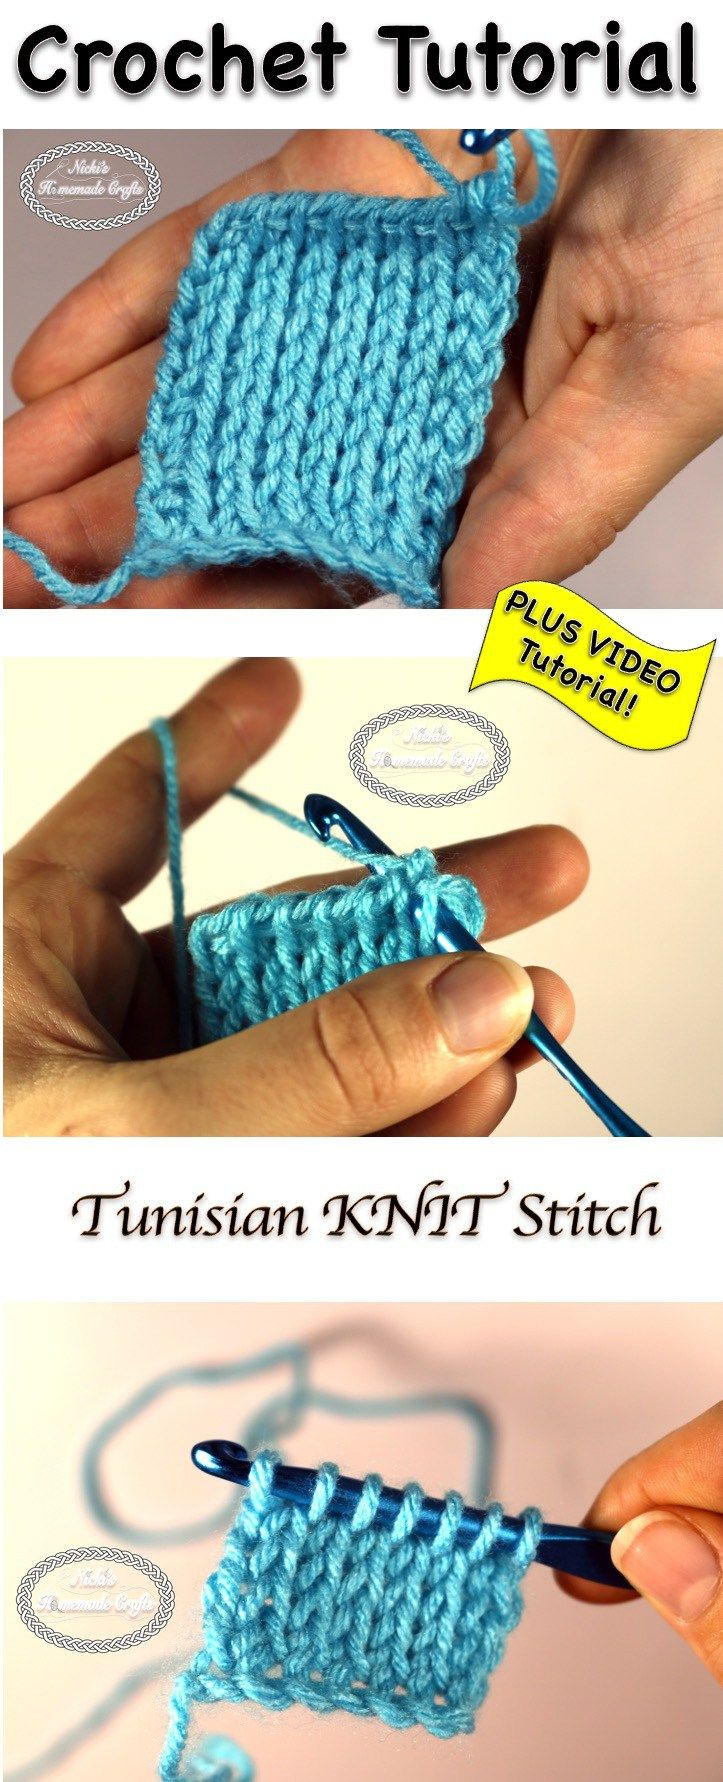 M 225 s de 1000 ideas sobre decoraciones de fiesta de safari en pinterest - Tunisian Knit Stitch Crochet Tutorial